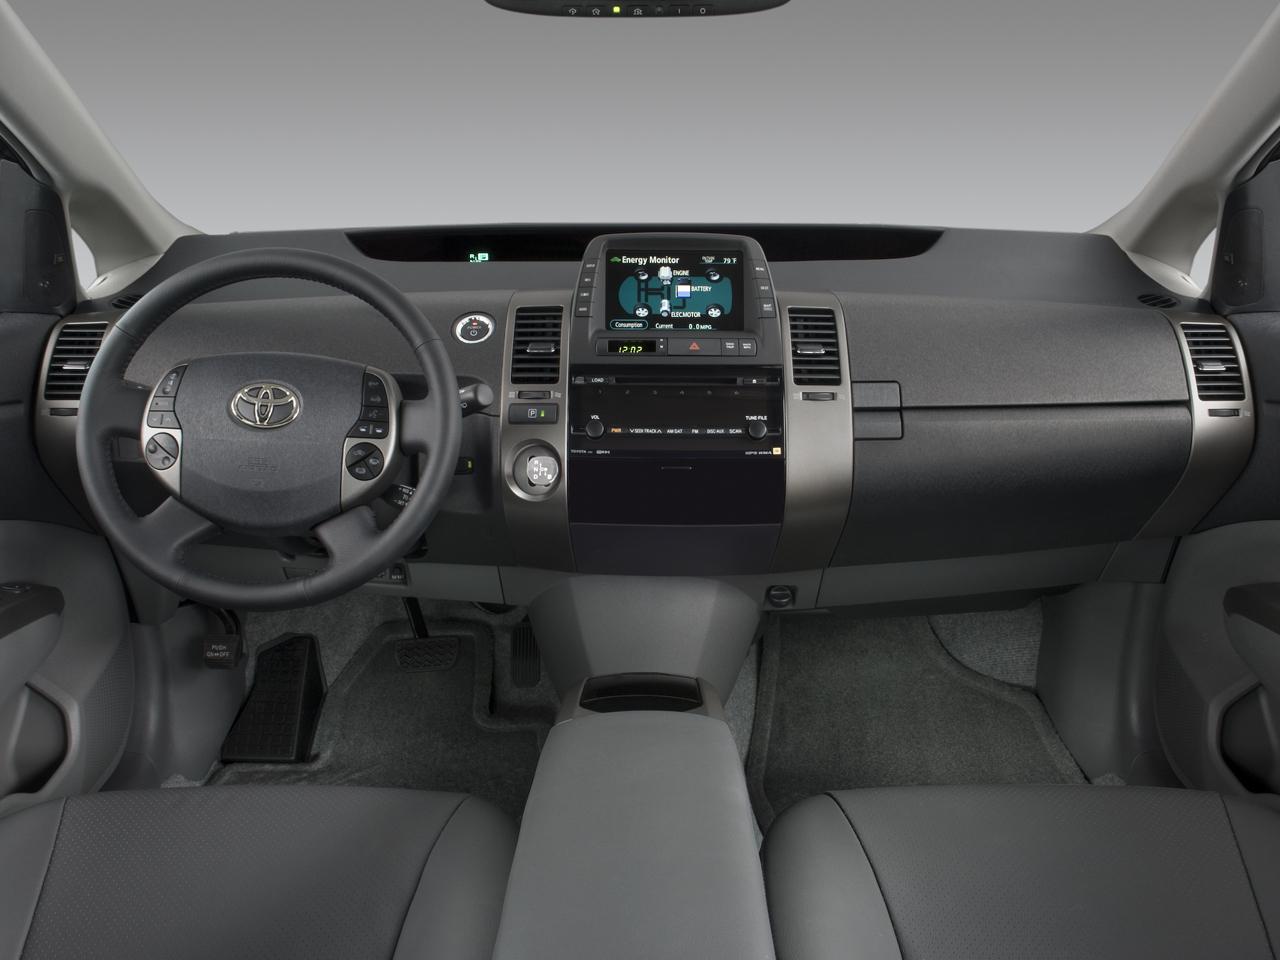 Toyota prius touring car | gran turismo wiki | fandom powered by wikia.